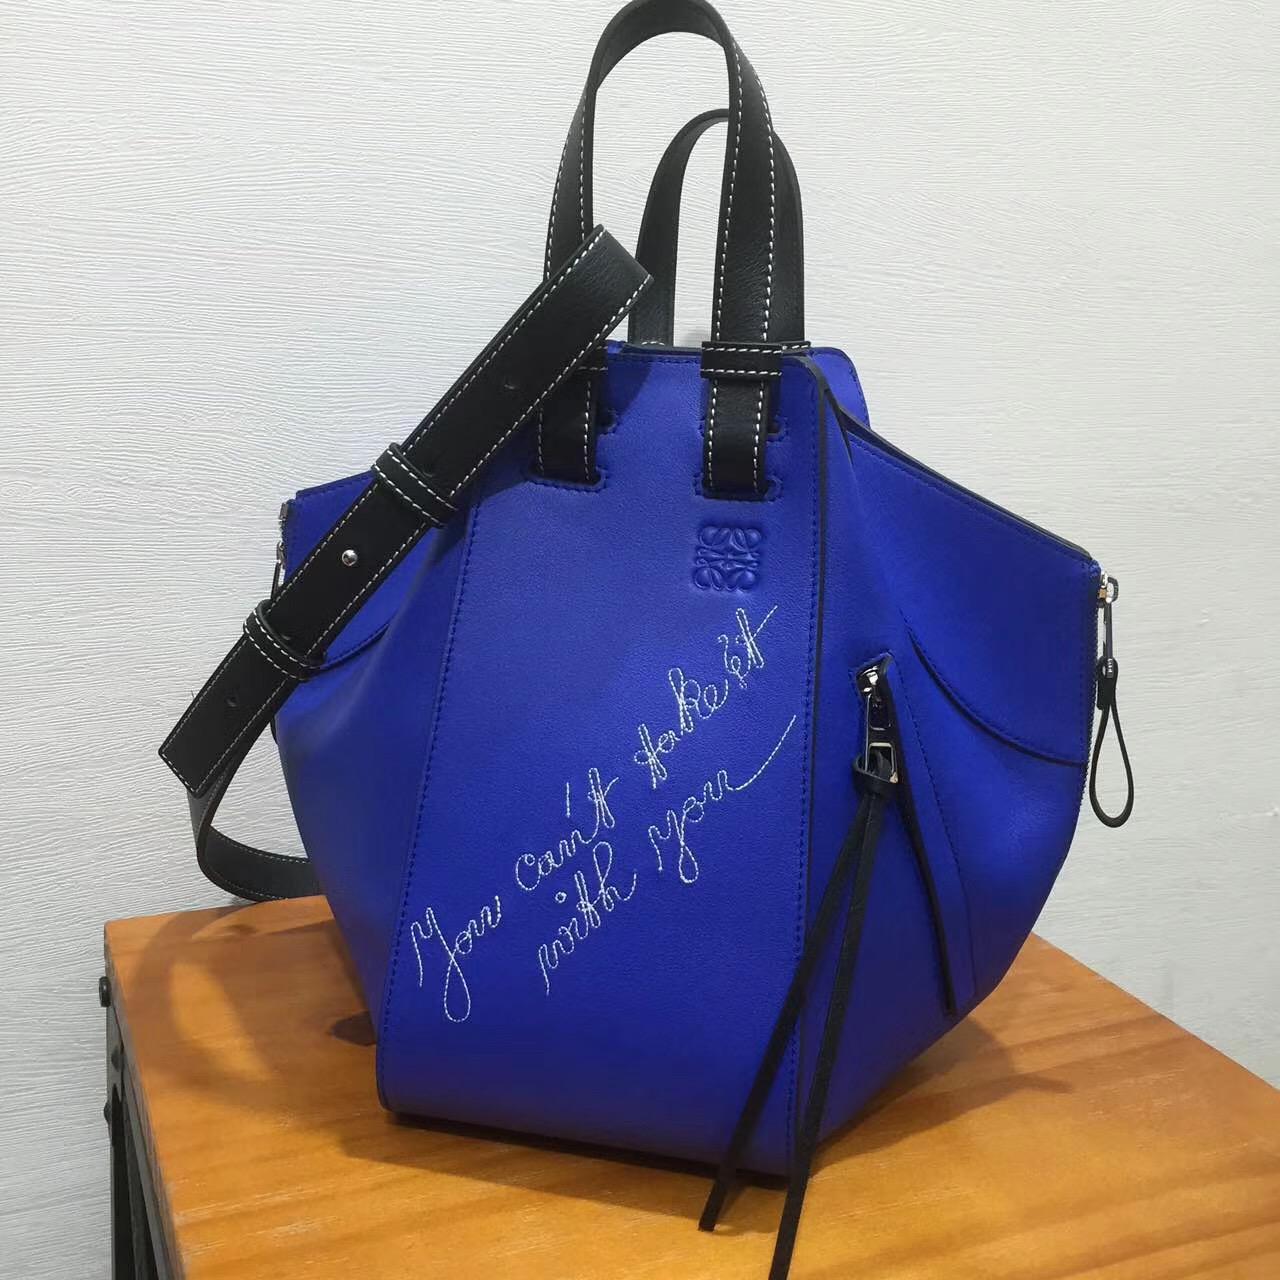 Loewe羅意威Hammock Cant Take It Small Bag 電光藍